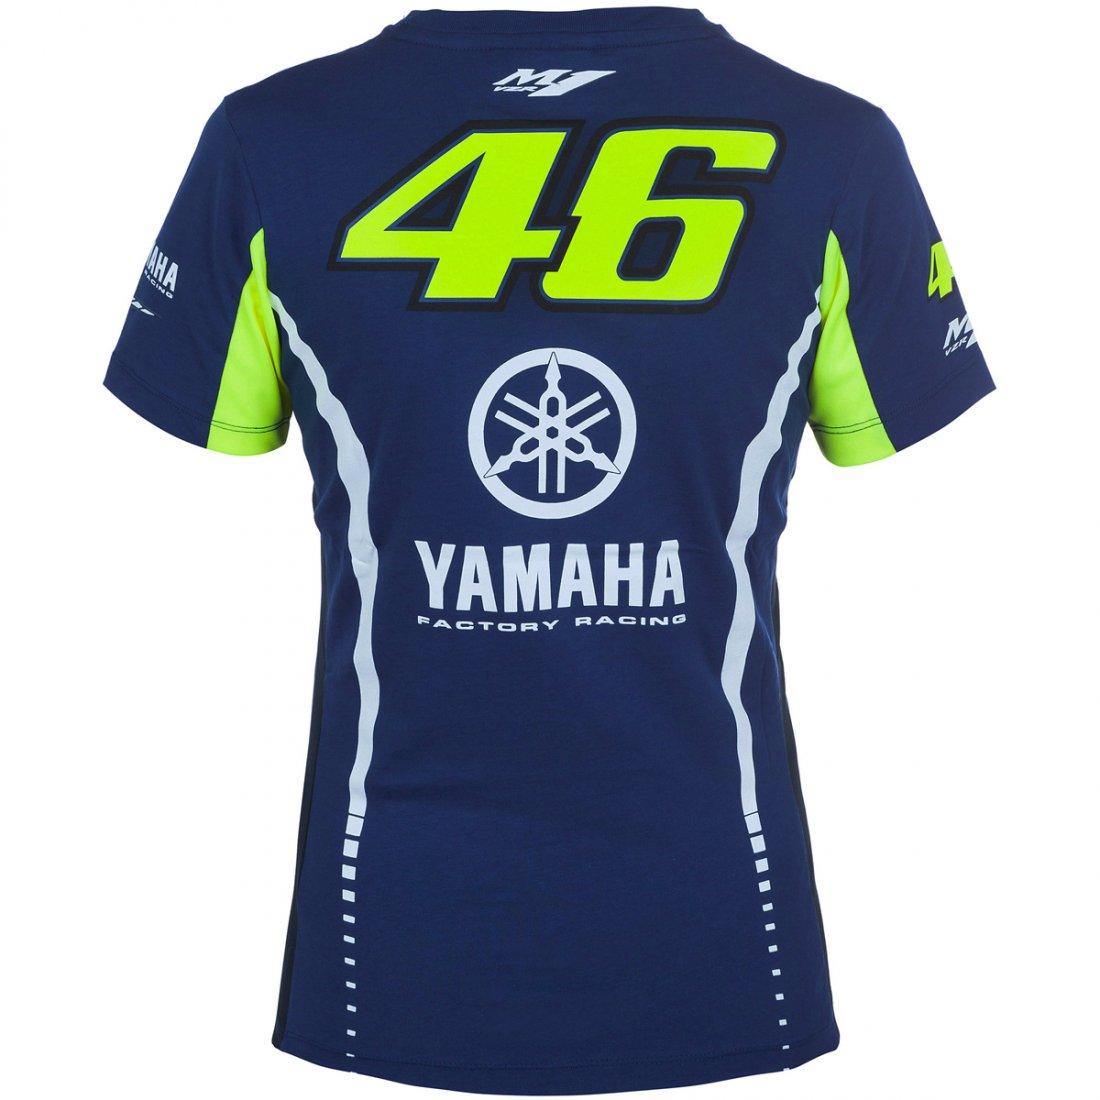 Camiseta VR46 Yamaha Rossi VR 46 272309 Lady · Motocard 1bcbb2b9ffd35